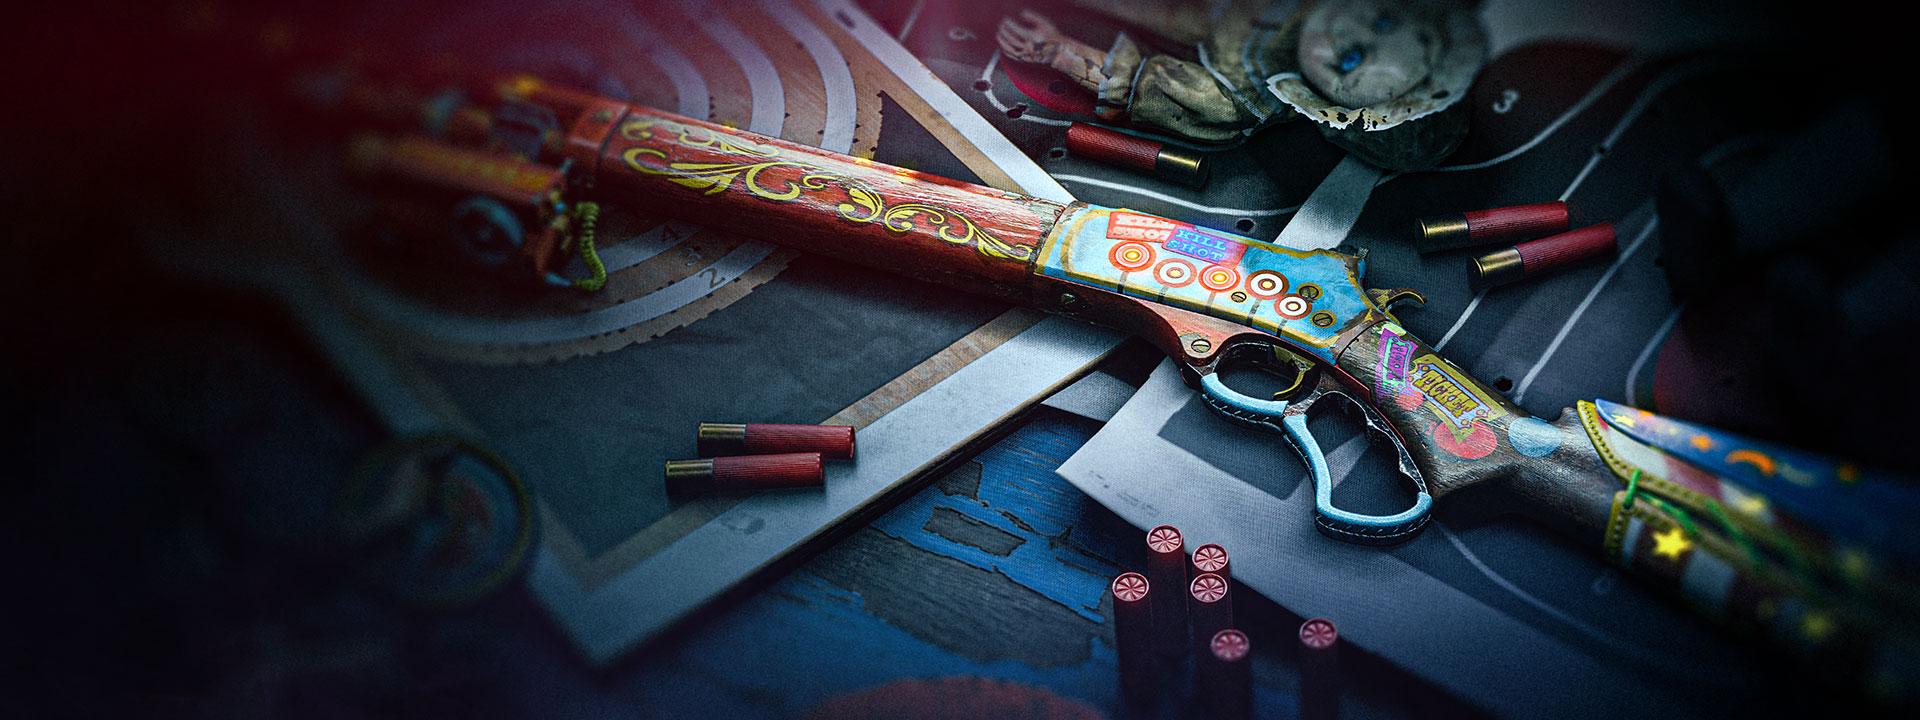 The Kill Shot Reactive Blueprint